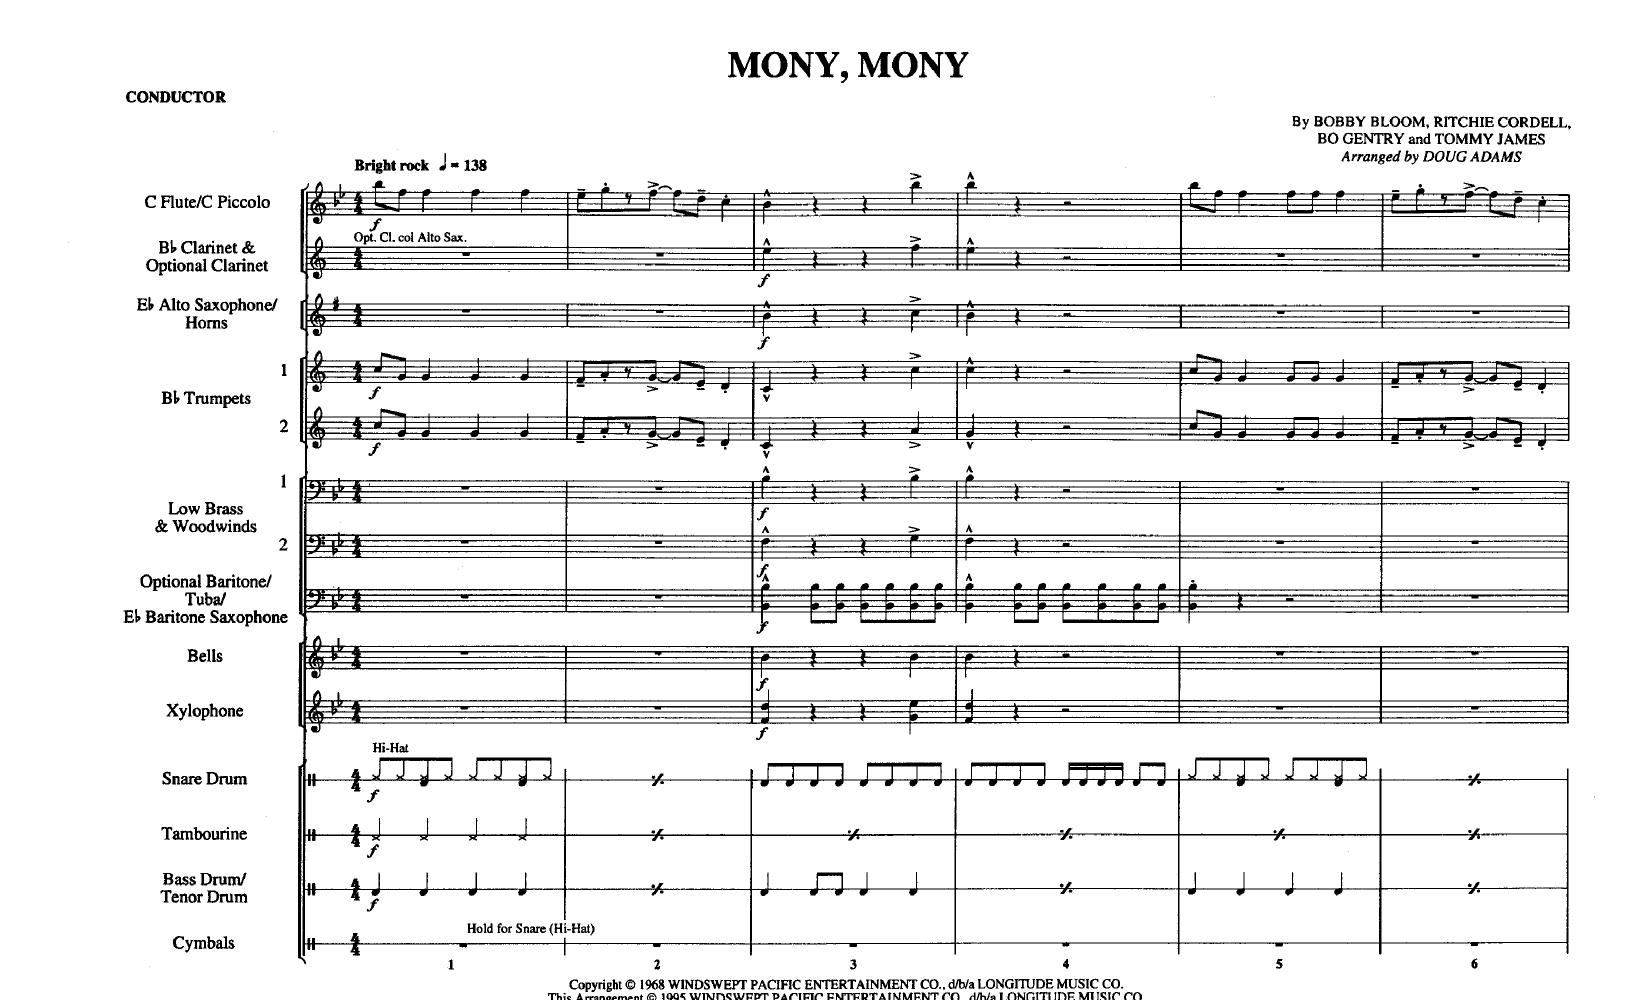 mony mony release date